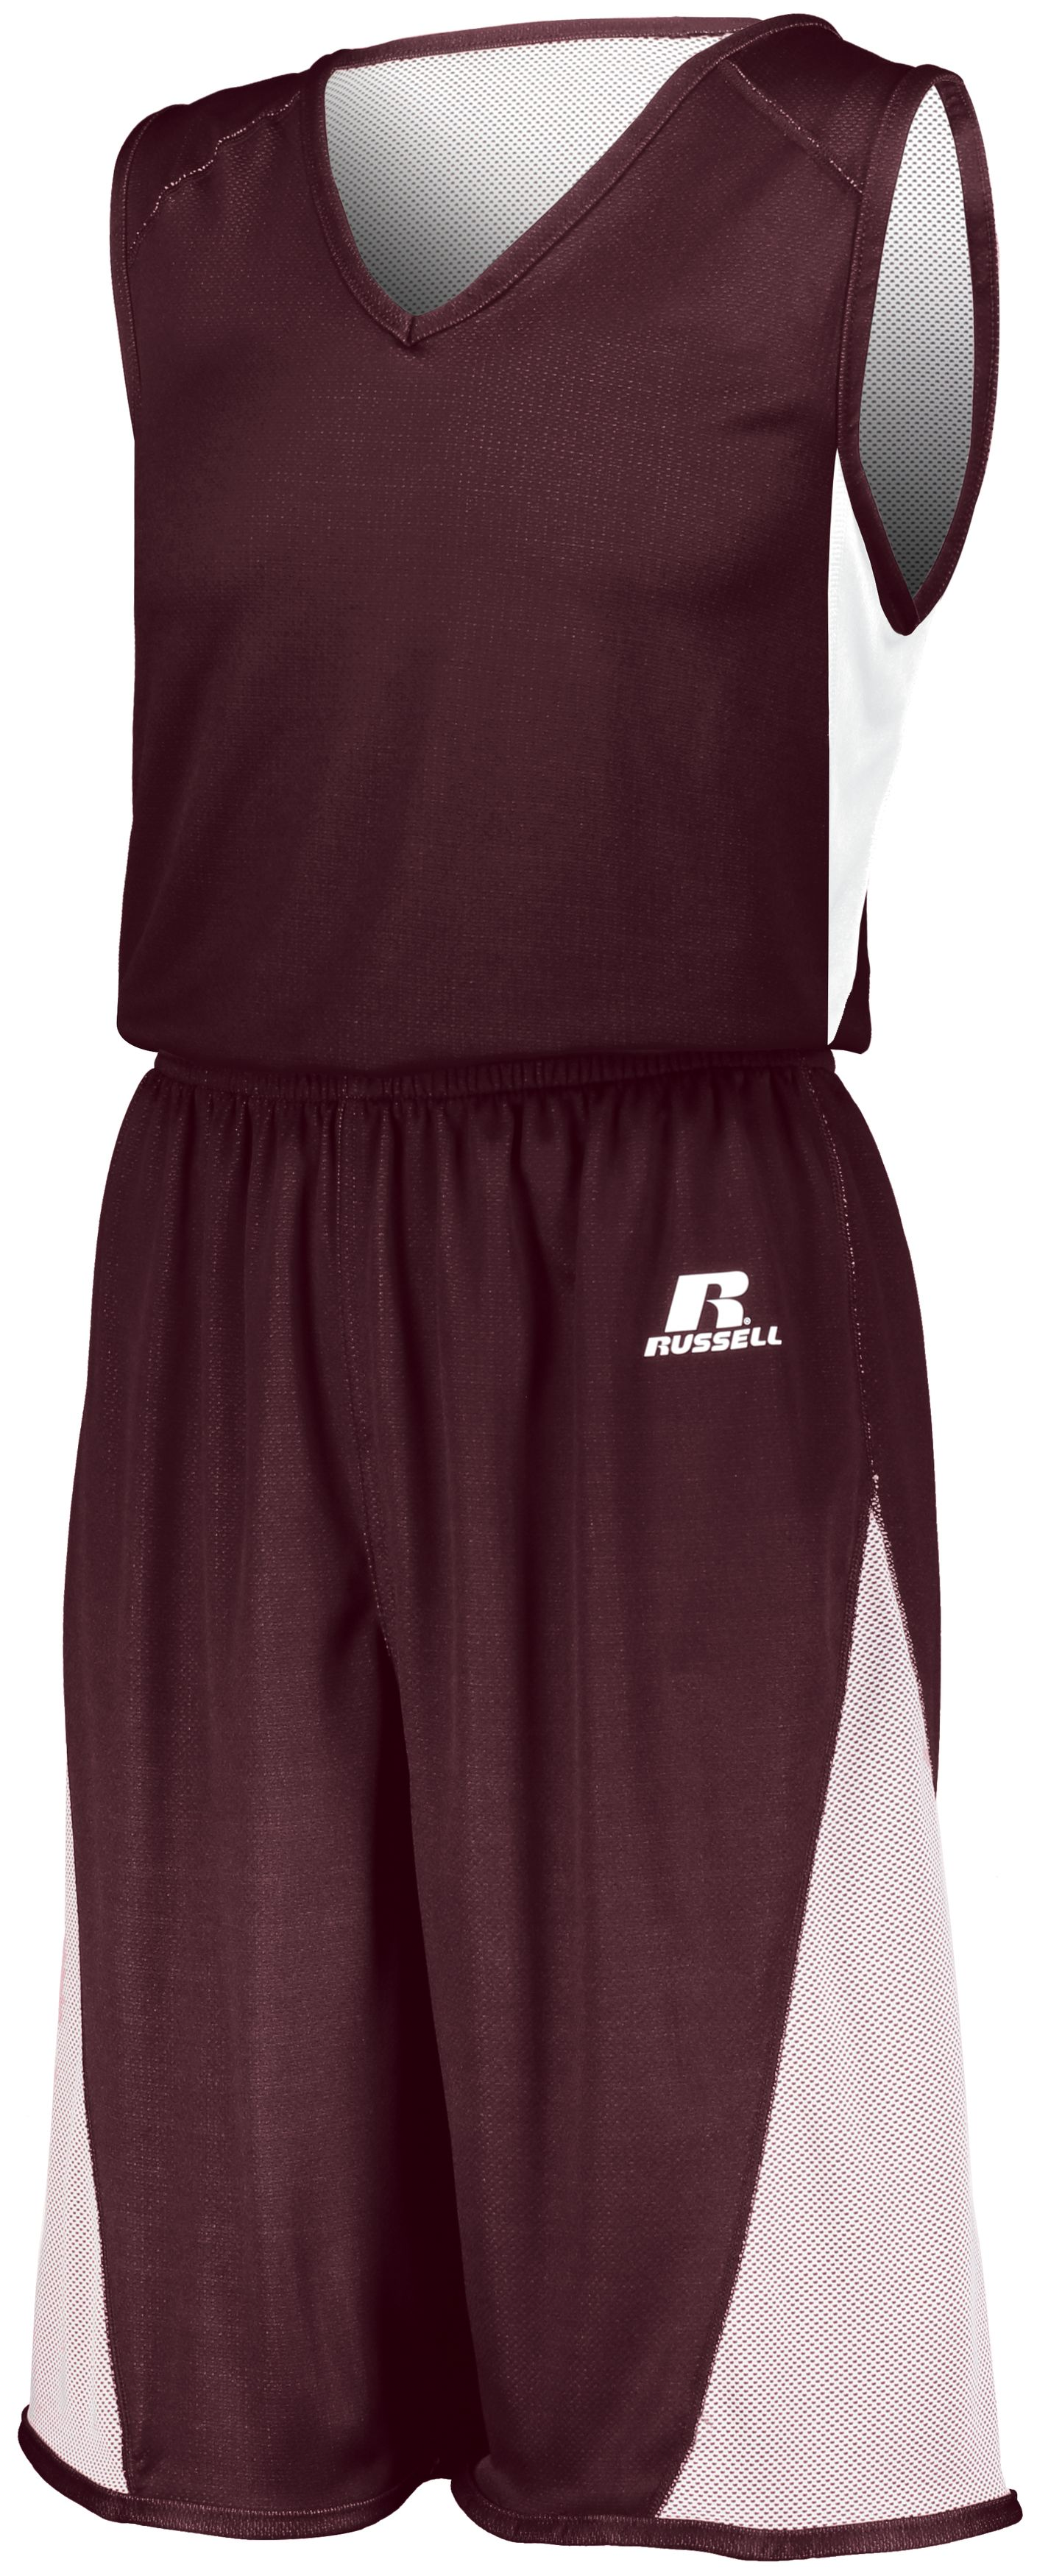 Undivided Single Ply Reversible Shorts - MAROON/WHITE